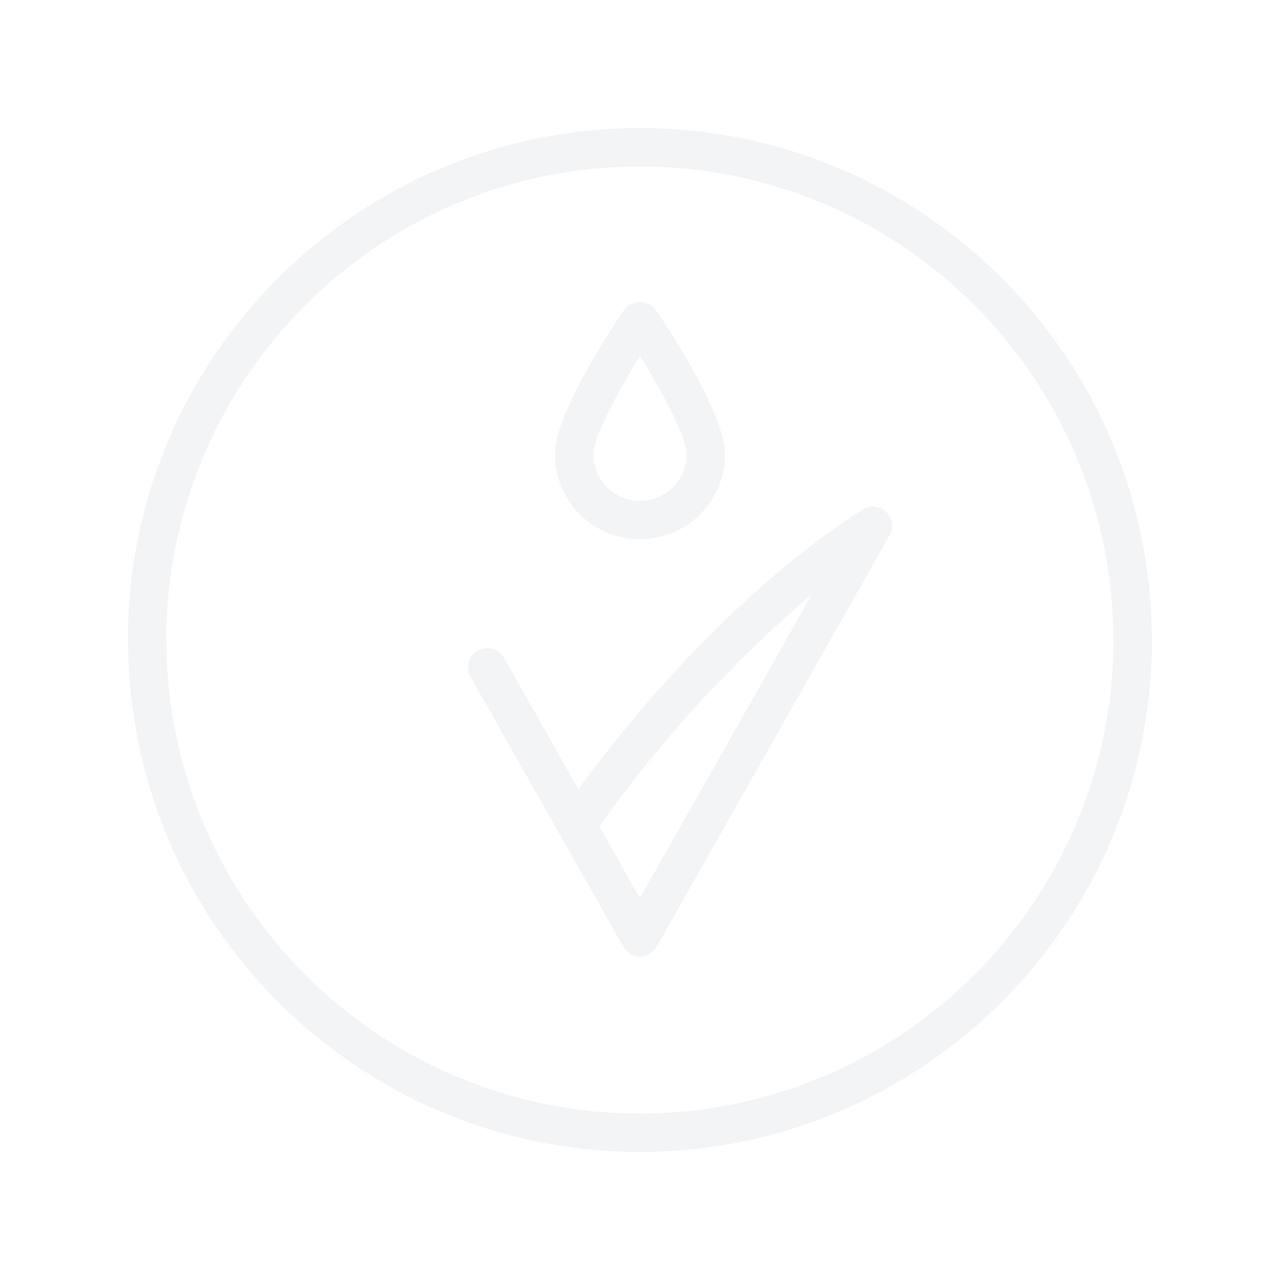 ALESSANDRO Nail Polish No.913 All Night Long 5ml